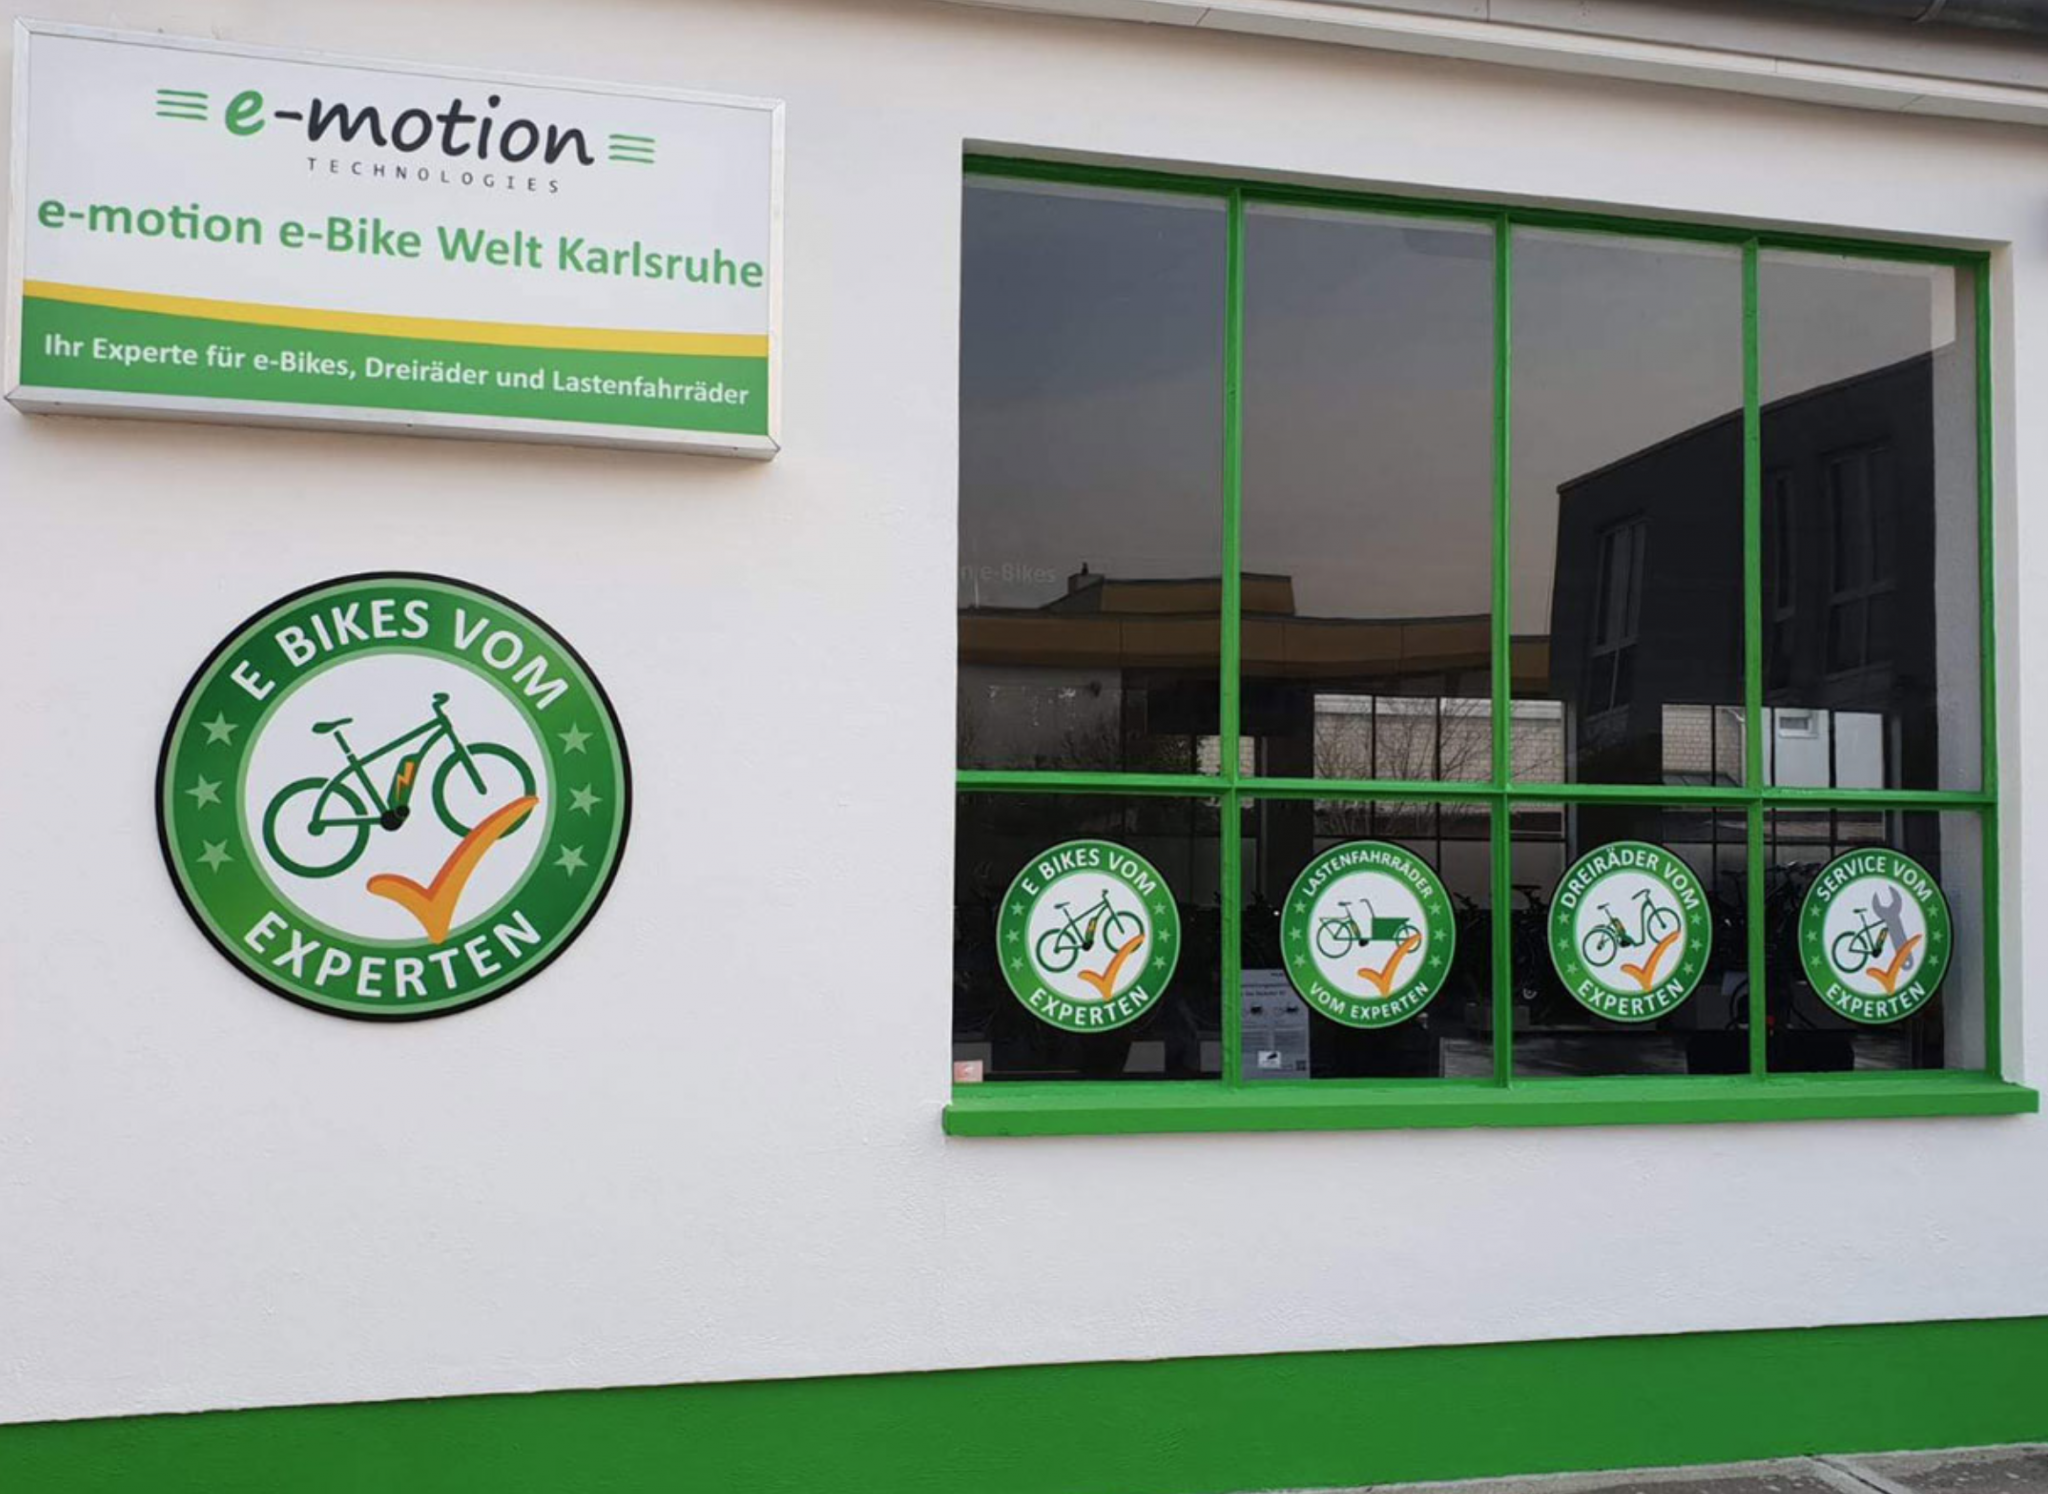 e-motion Karlsruhe